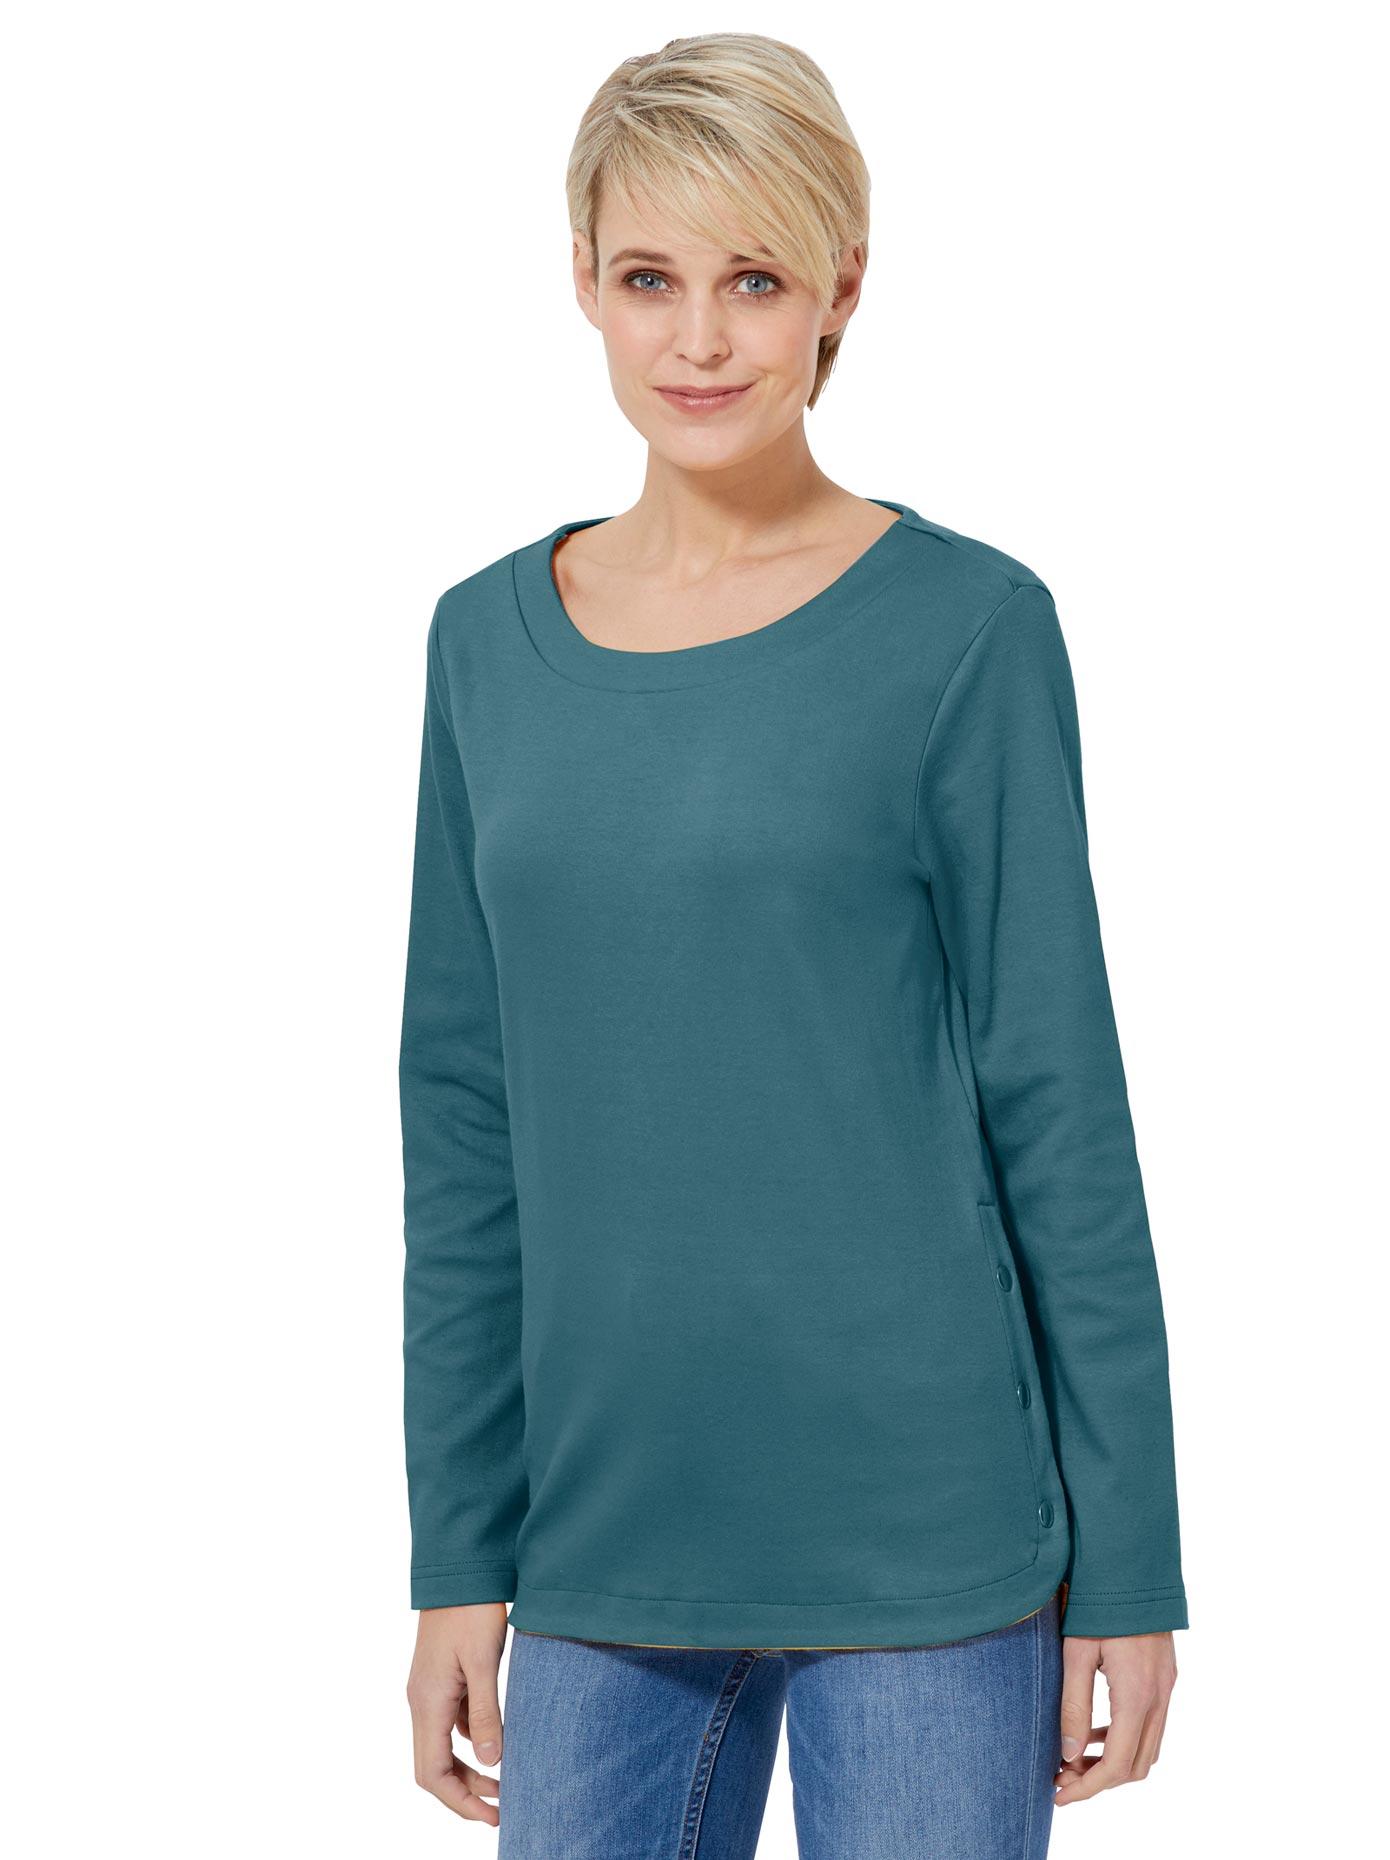 casual looks -  Shirt in hochwertiger, formstabiler Interlock-Qualität